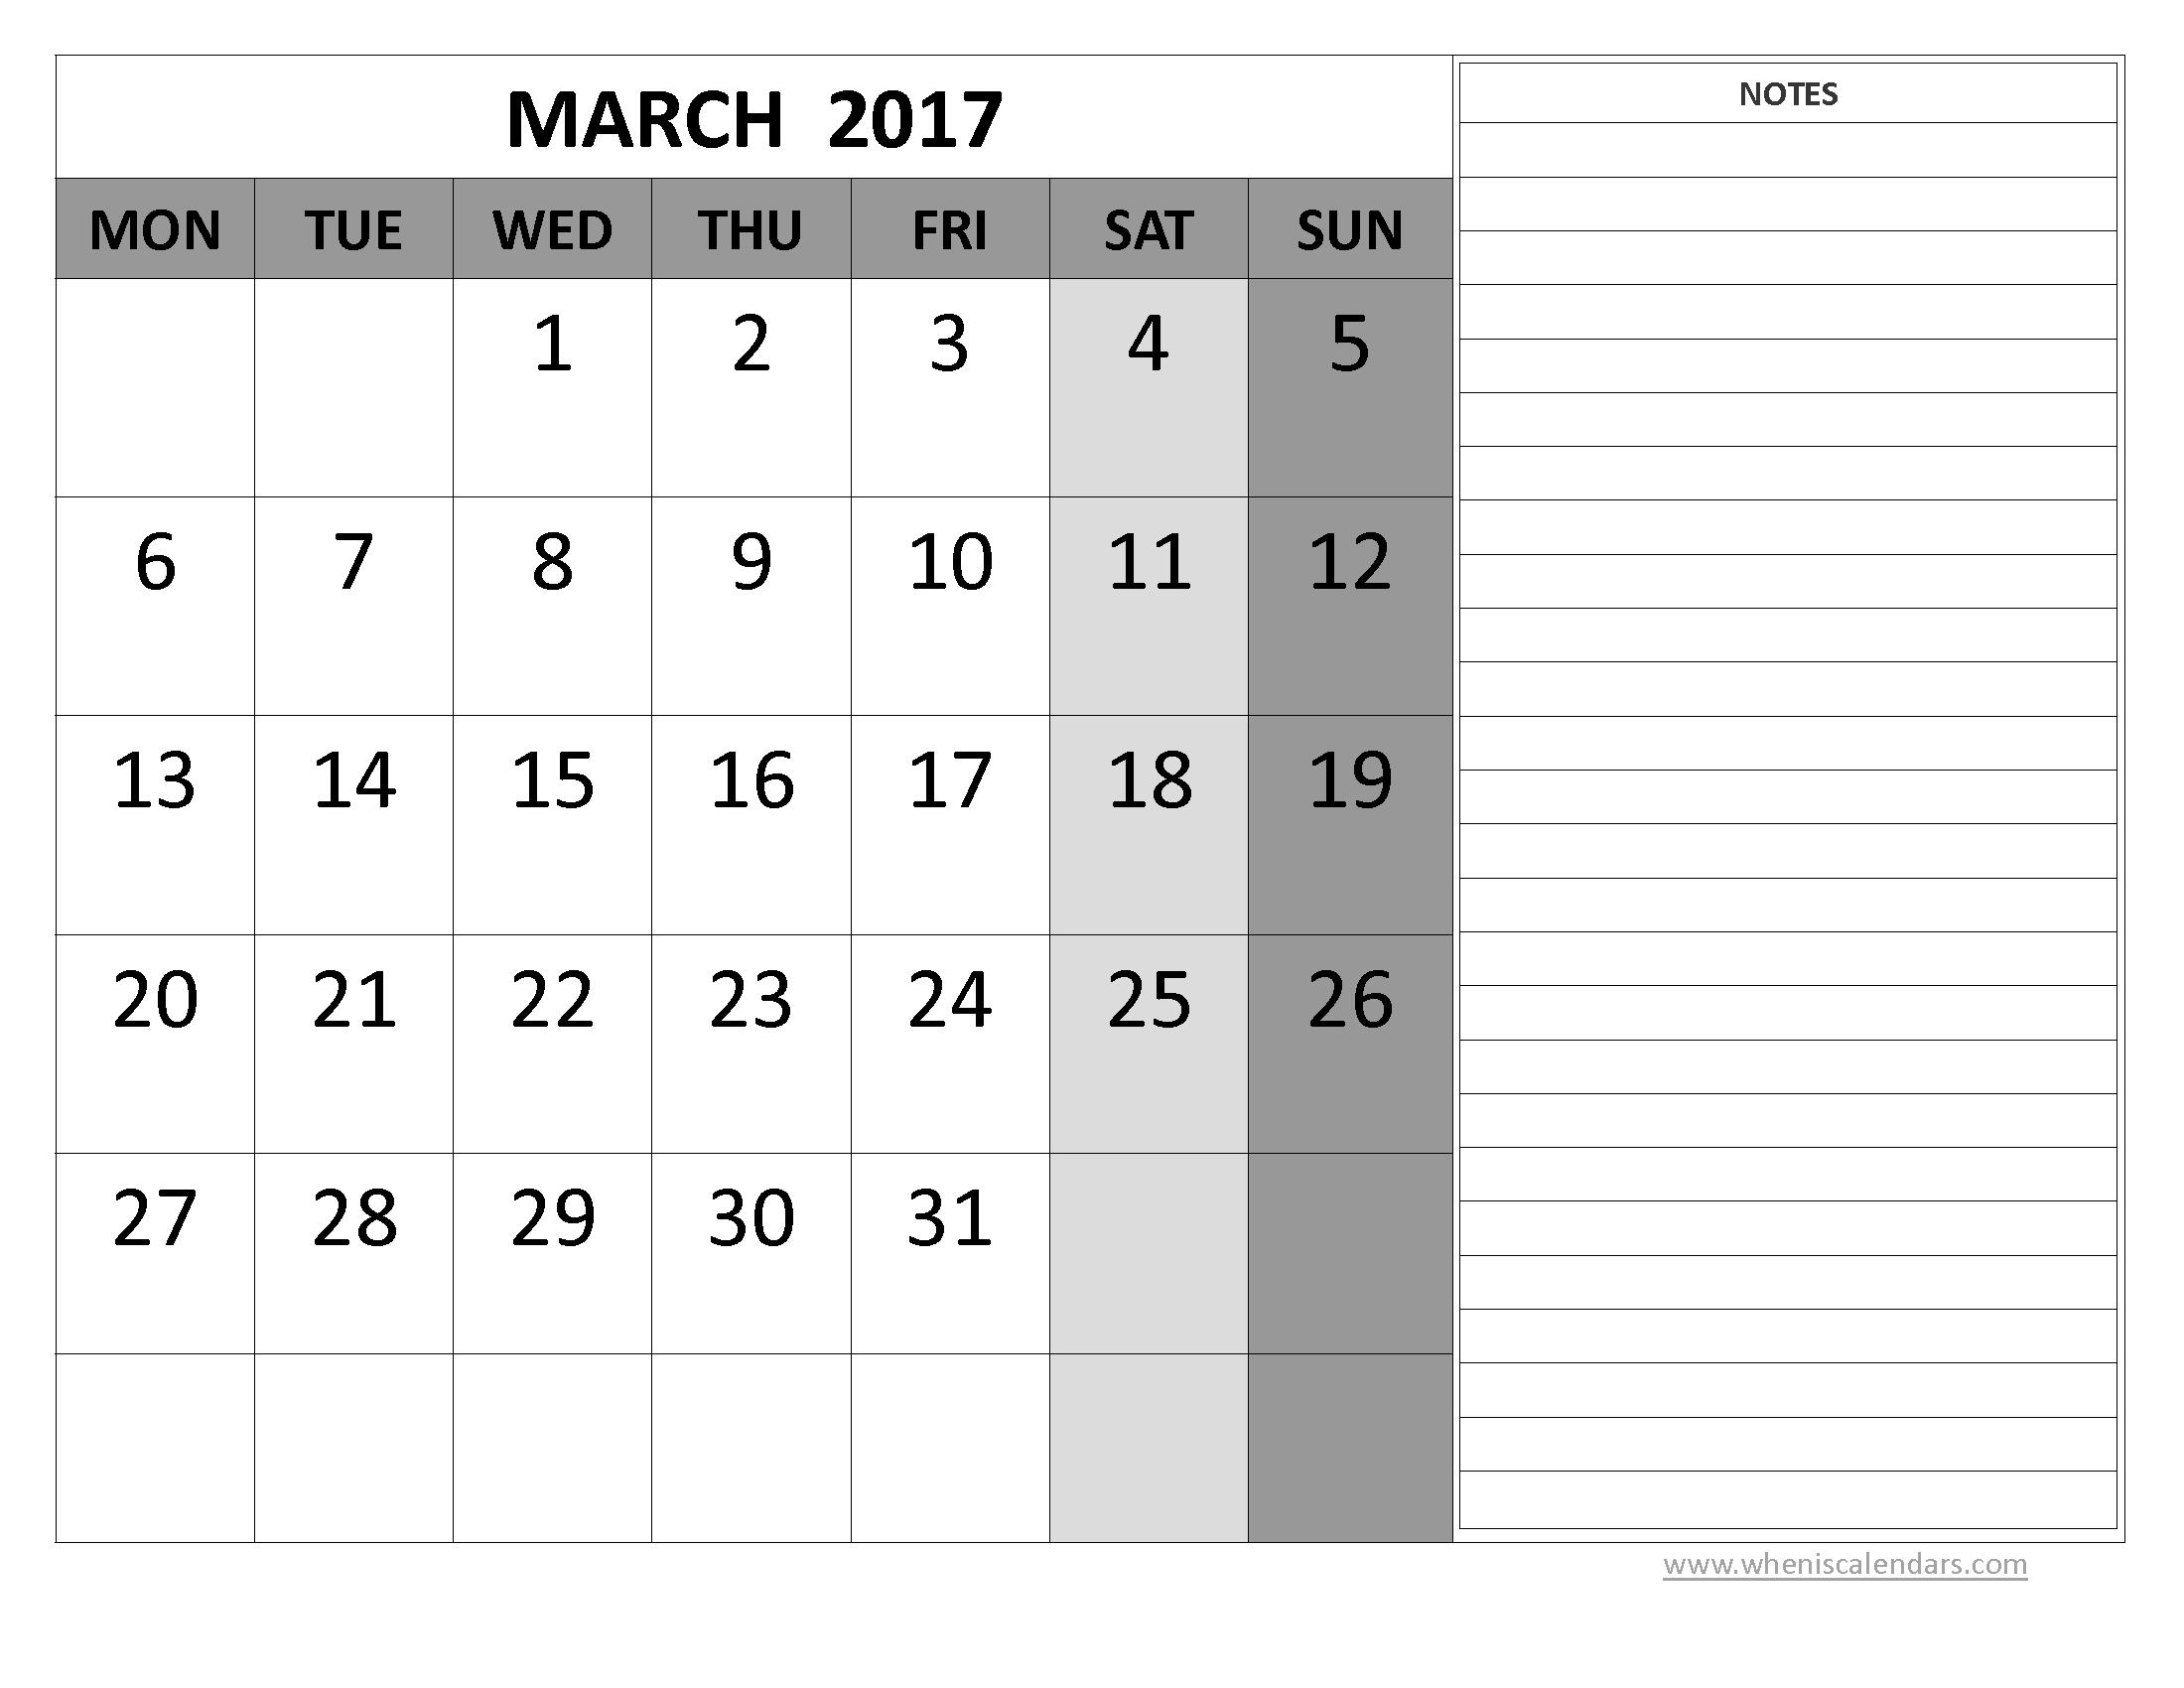 March Calendar 2017 Printable Pdf – 2017 March Calendar